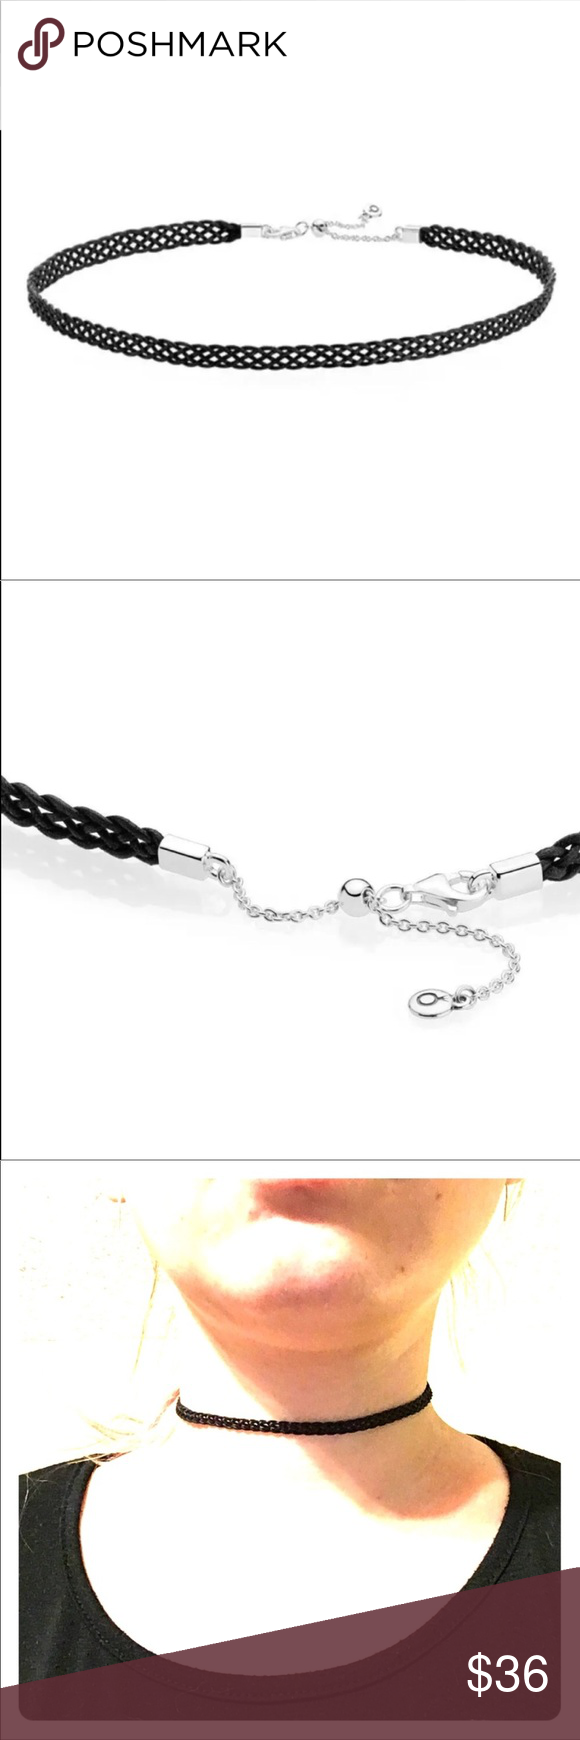 "f63ab0ac4 Pandora black woven choker necklace Authentic Pandora black woven cord choker  necklace 12.5""/32cm"